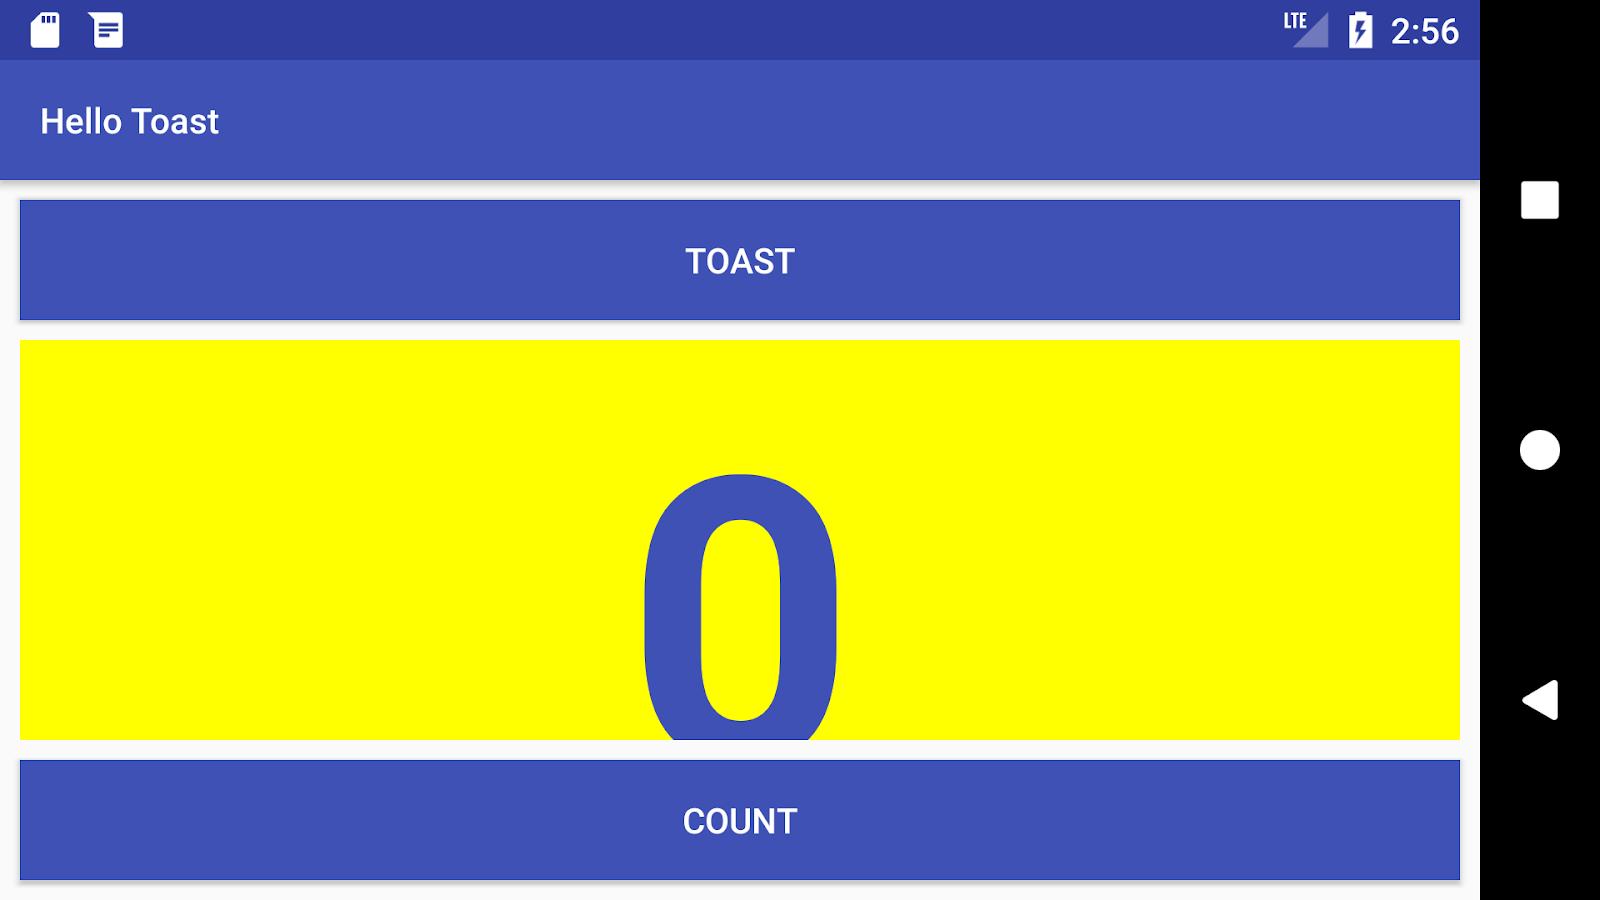 The Hello Toast app in horizontal orientation